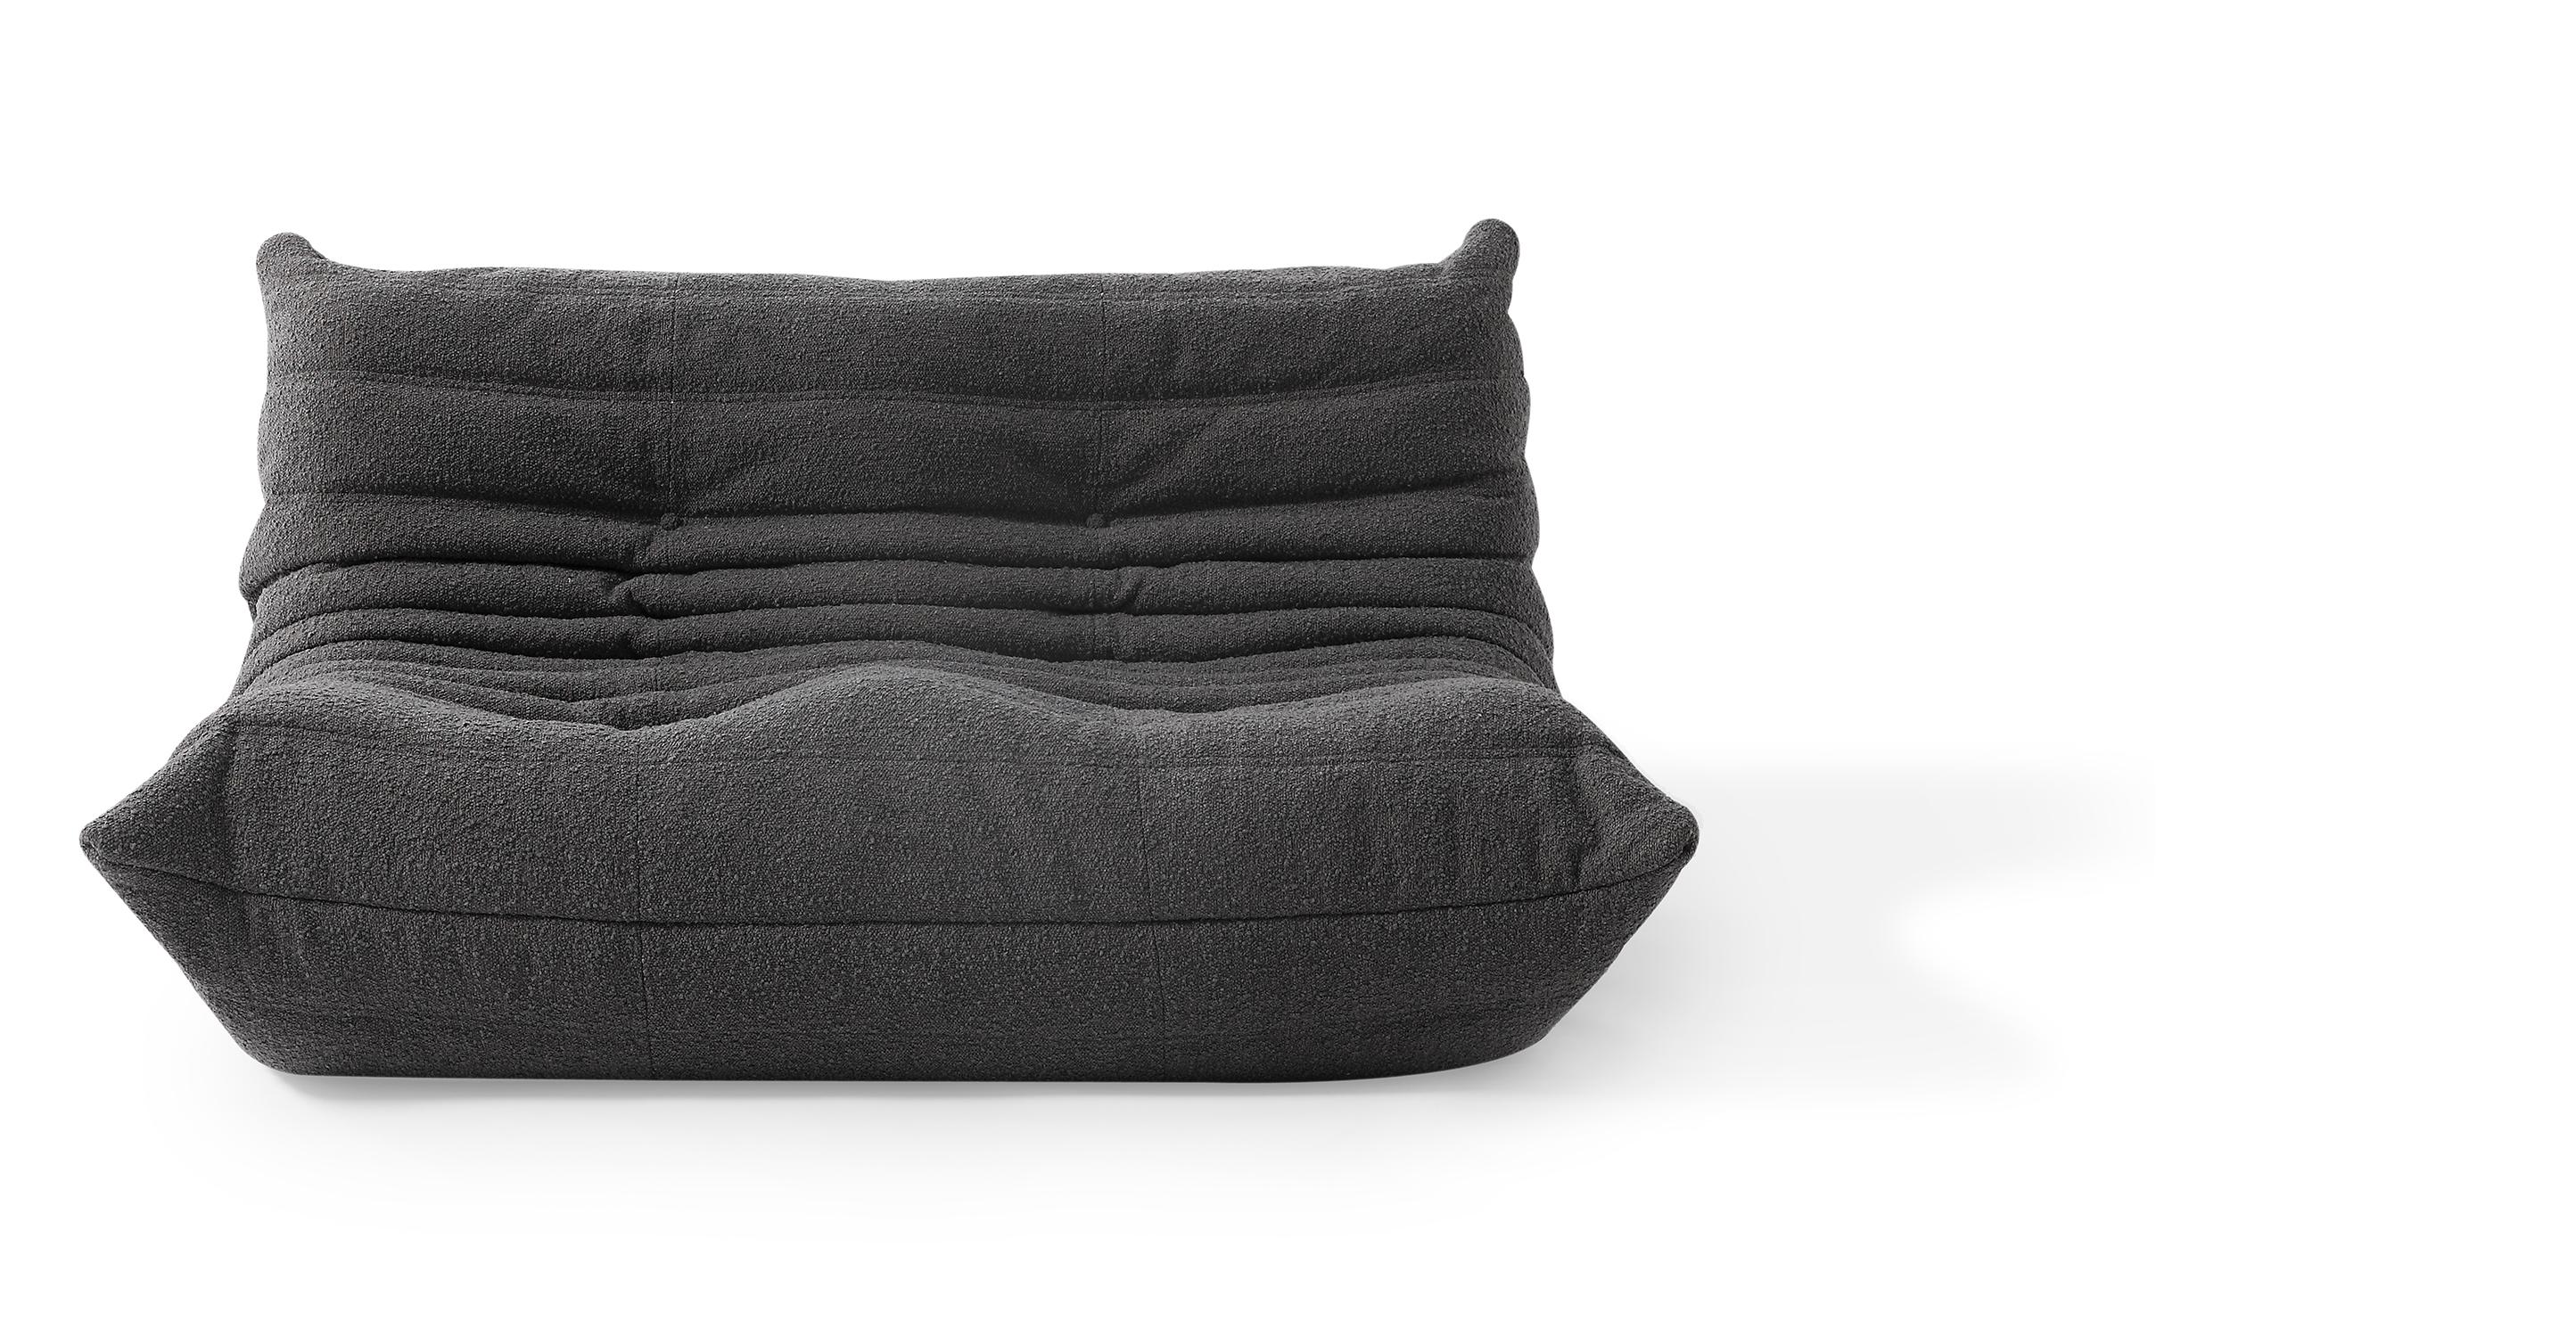 "Louvre 53"" Fabric 2-Seat Sofa, Gris Boucle"